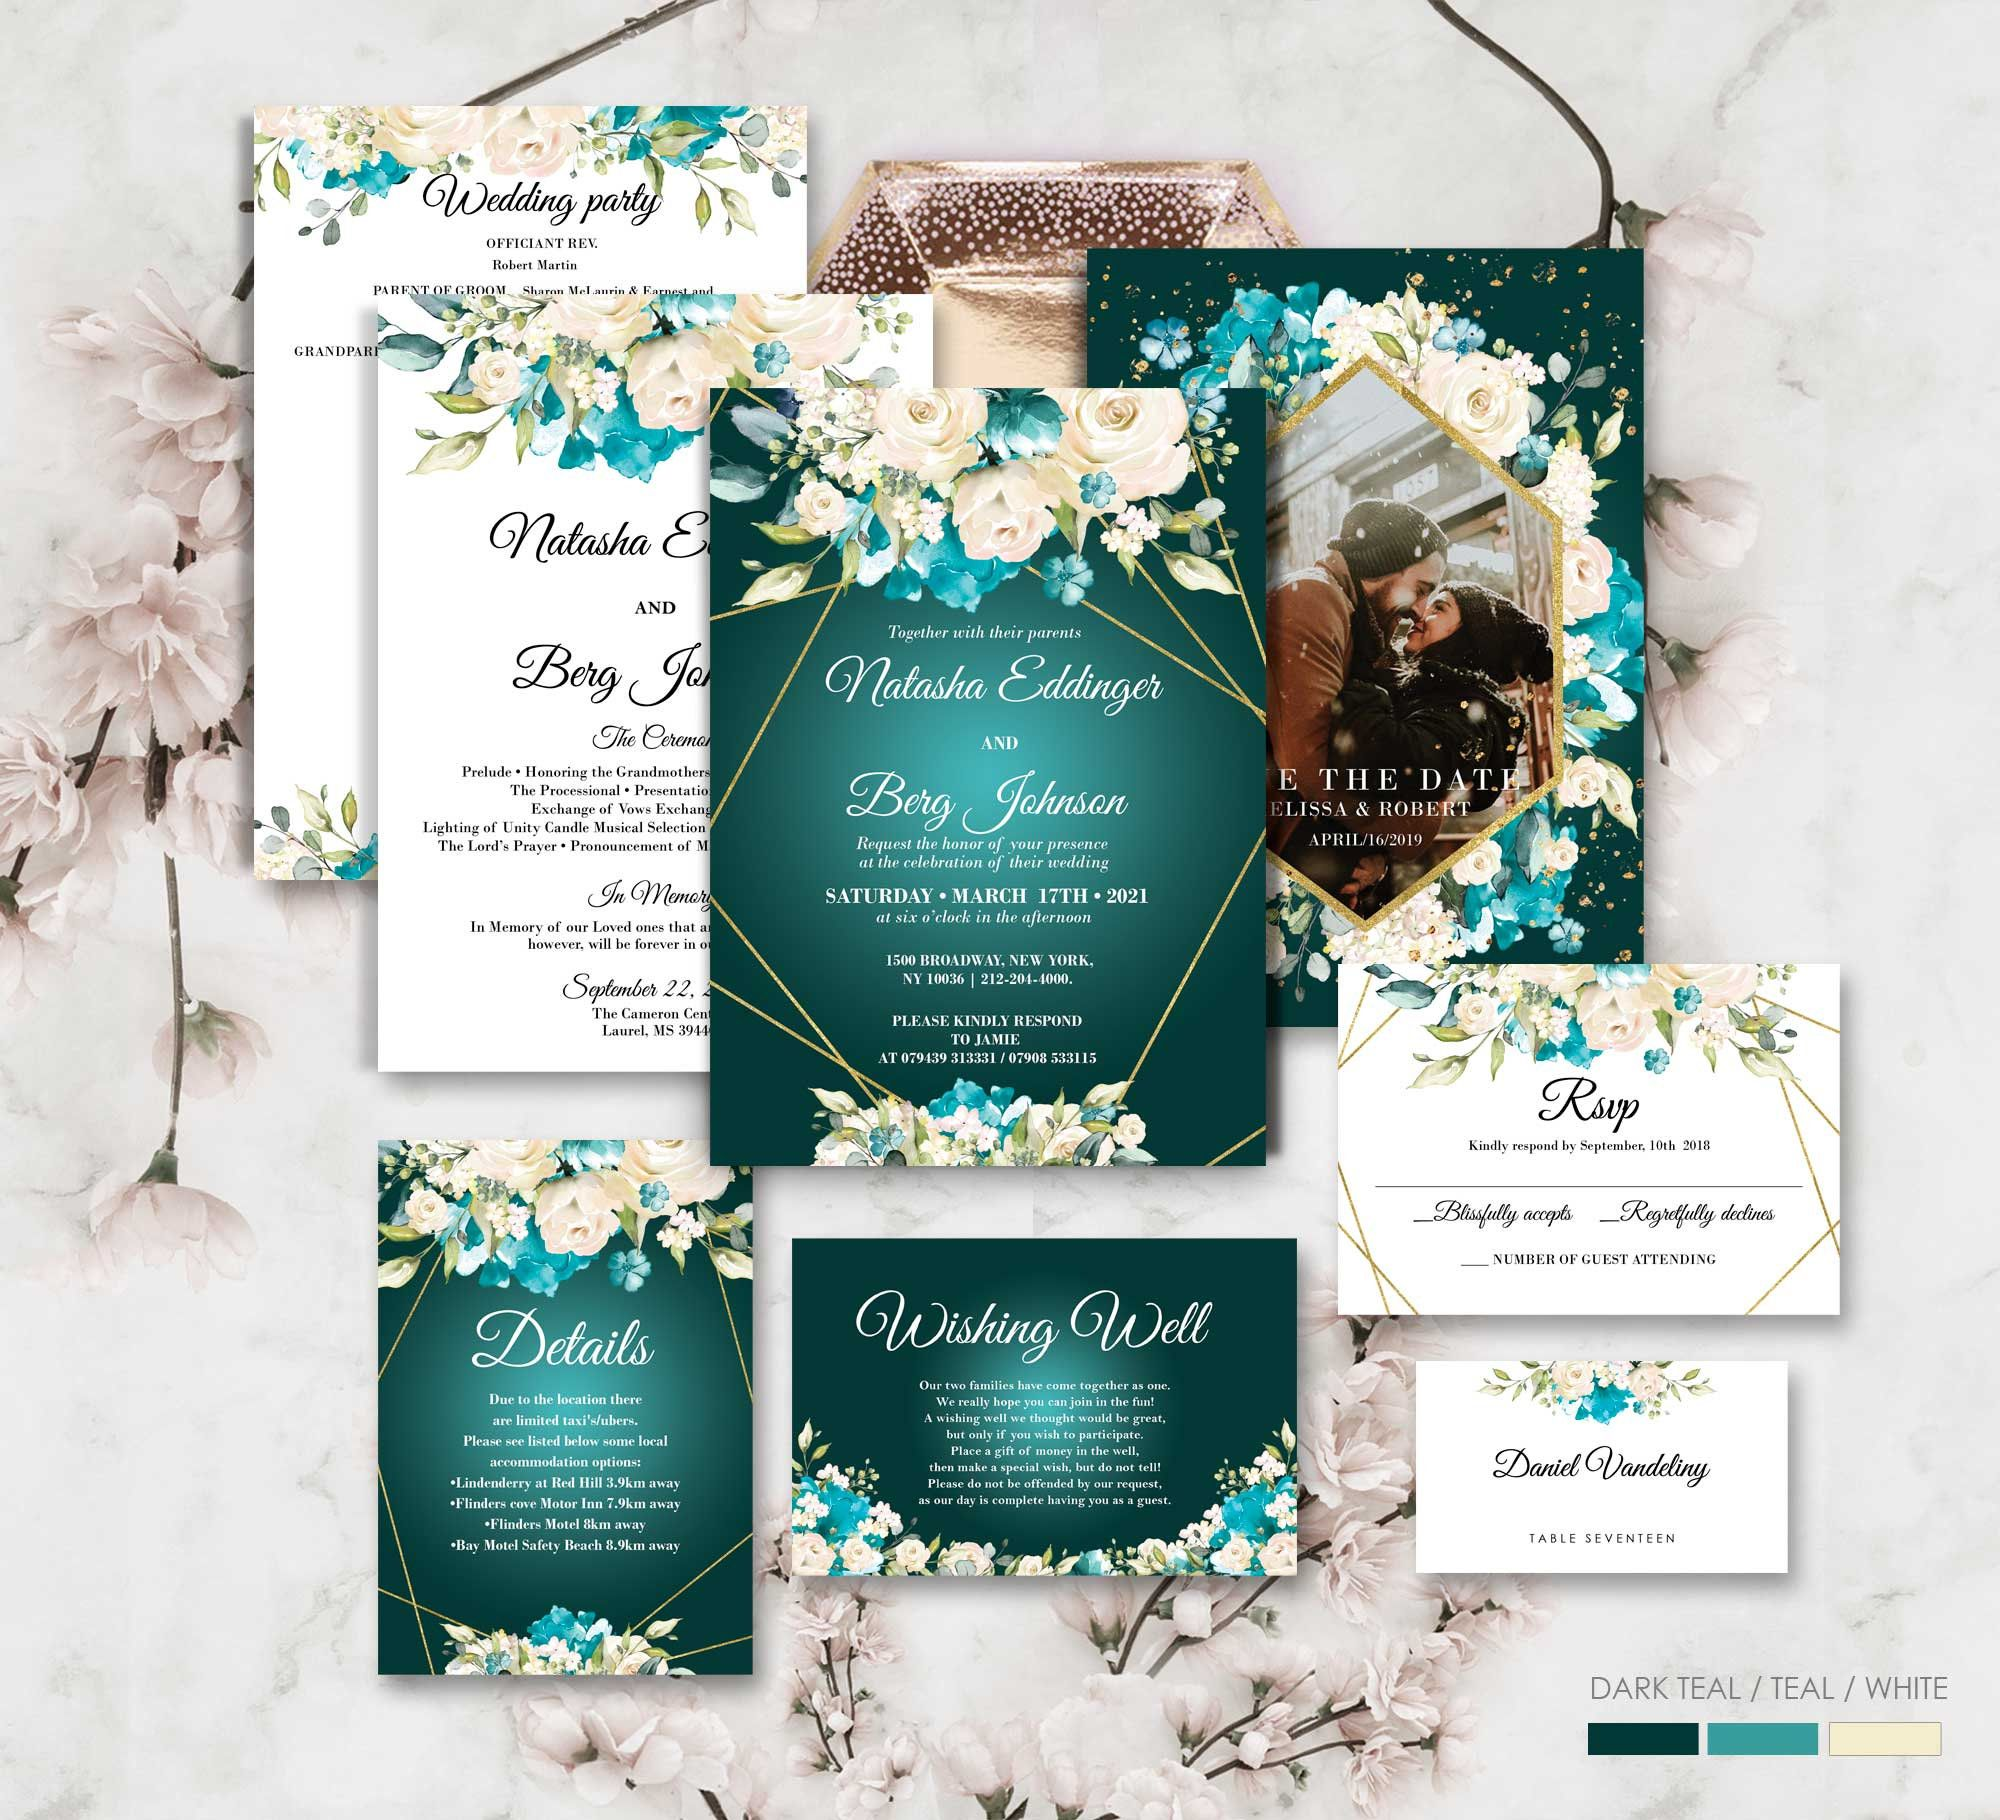 Editable Wedding Invitation Template Teal And White Floral Etsy Teal Wedding Invitations Turquoise Wedding Invitations Wedding Invitation Templates